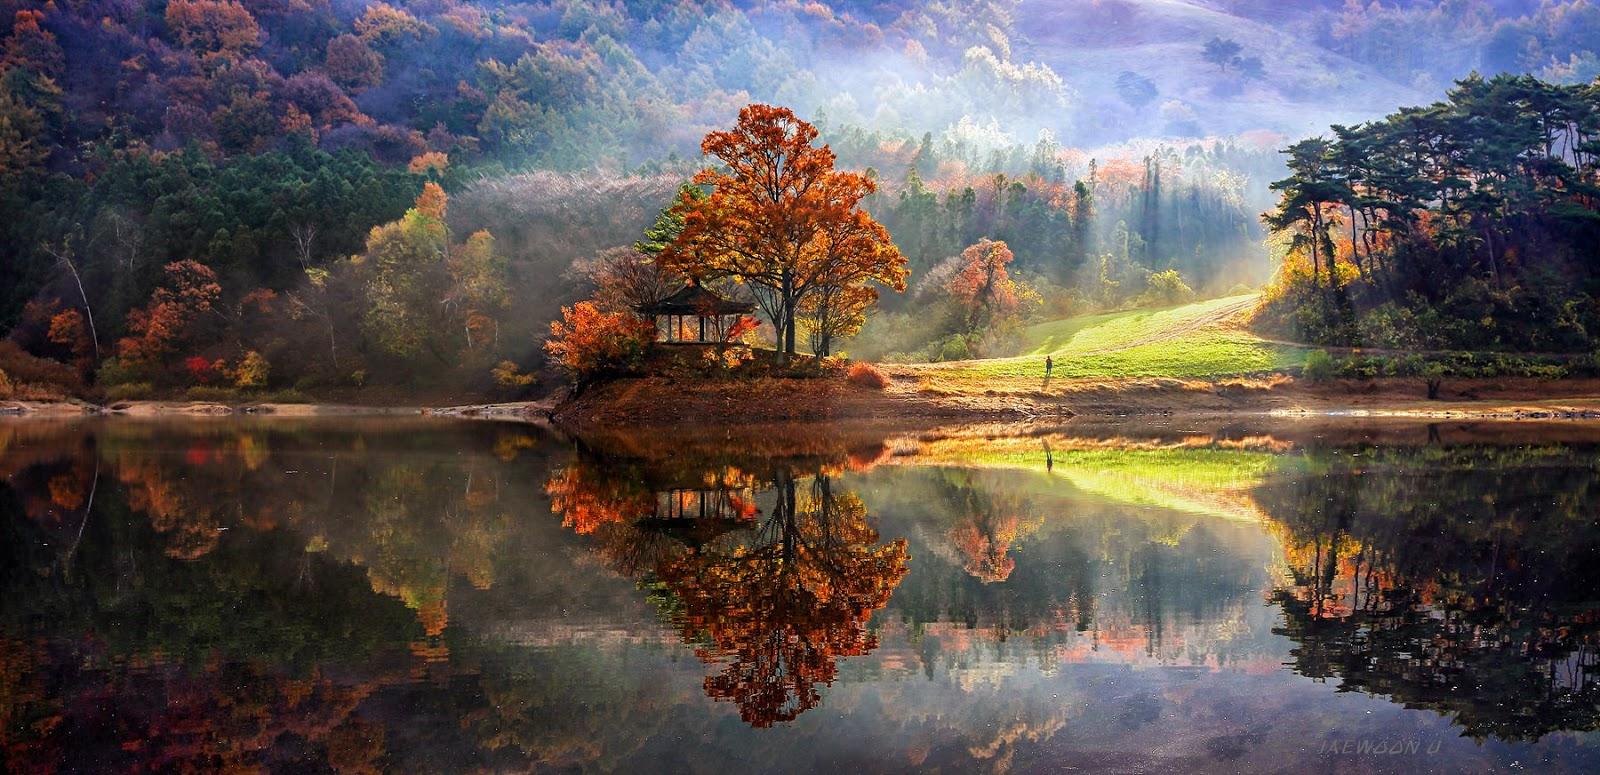 Stunning Scenery From The Photographer Jaewoon U